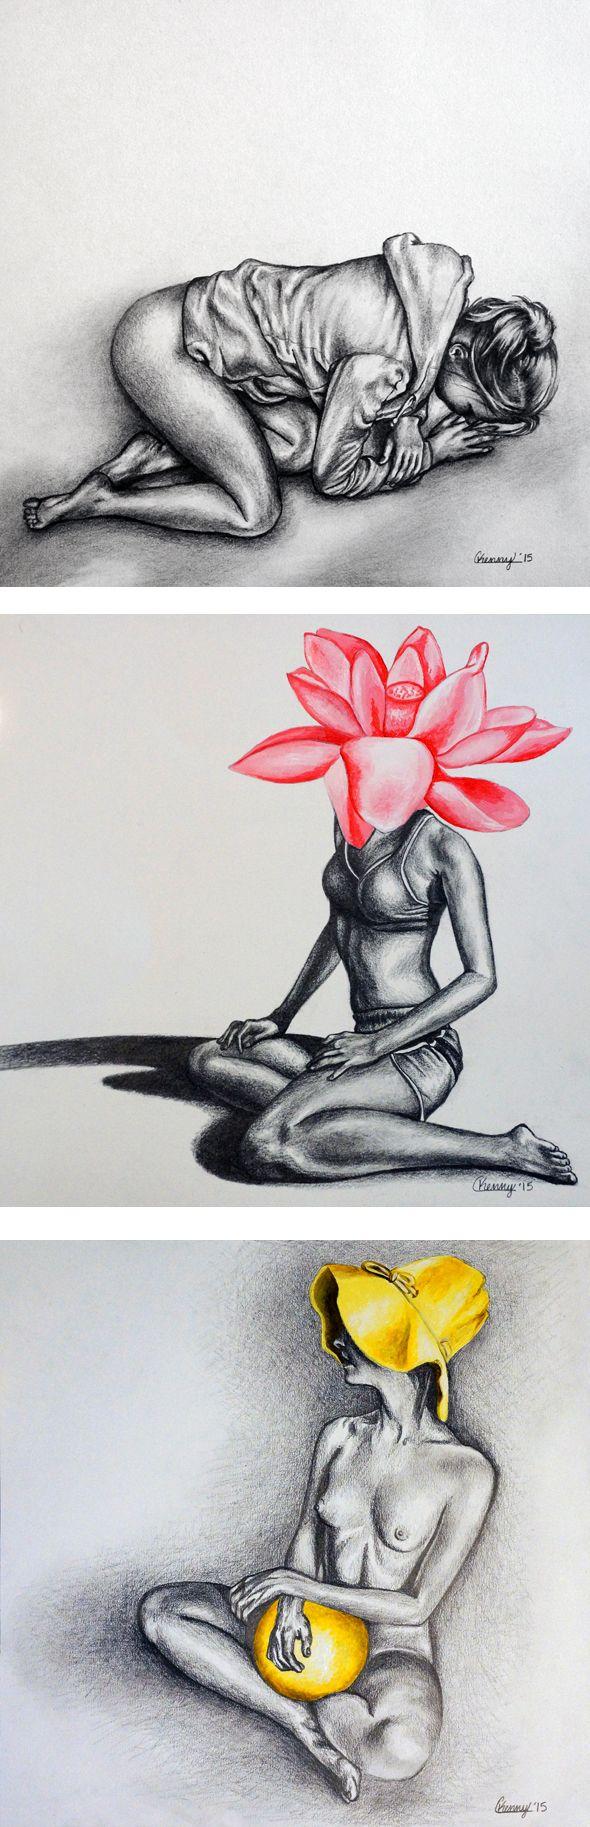 Courtney Kenny Porto graphite drawings #yellow #pink #flower #feminism #female #form #realism #modern #figurative